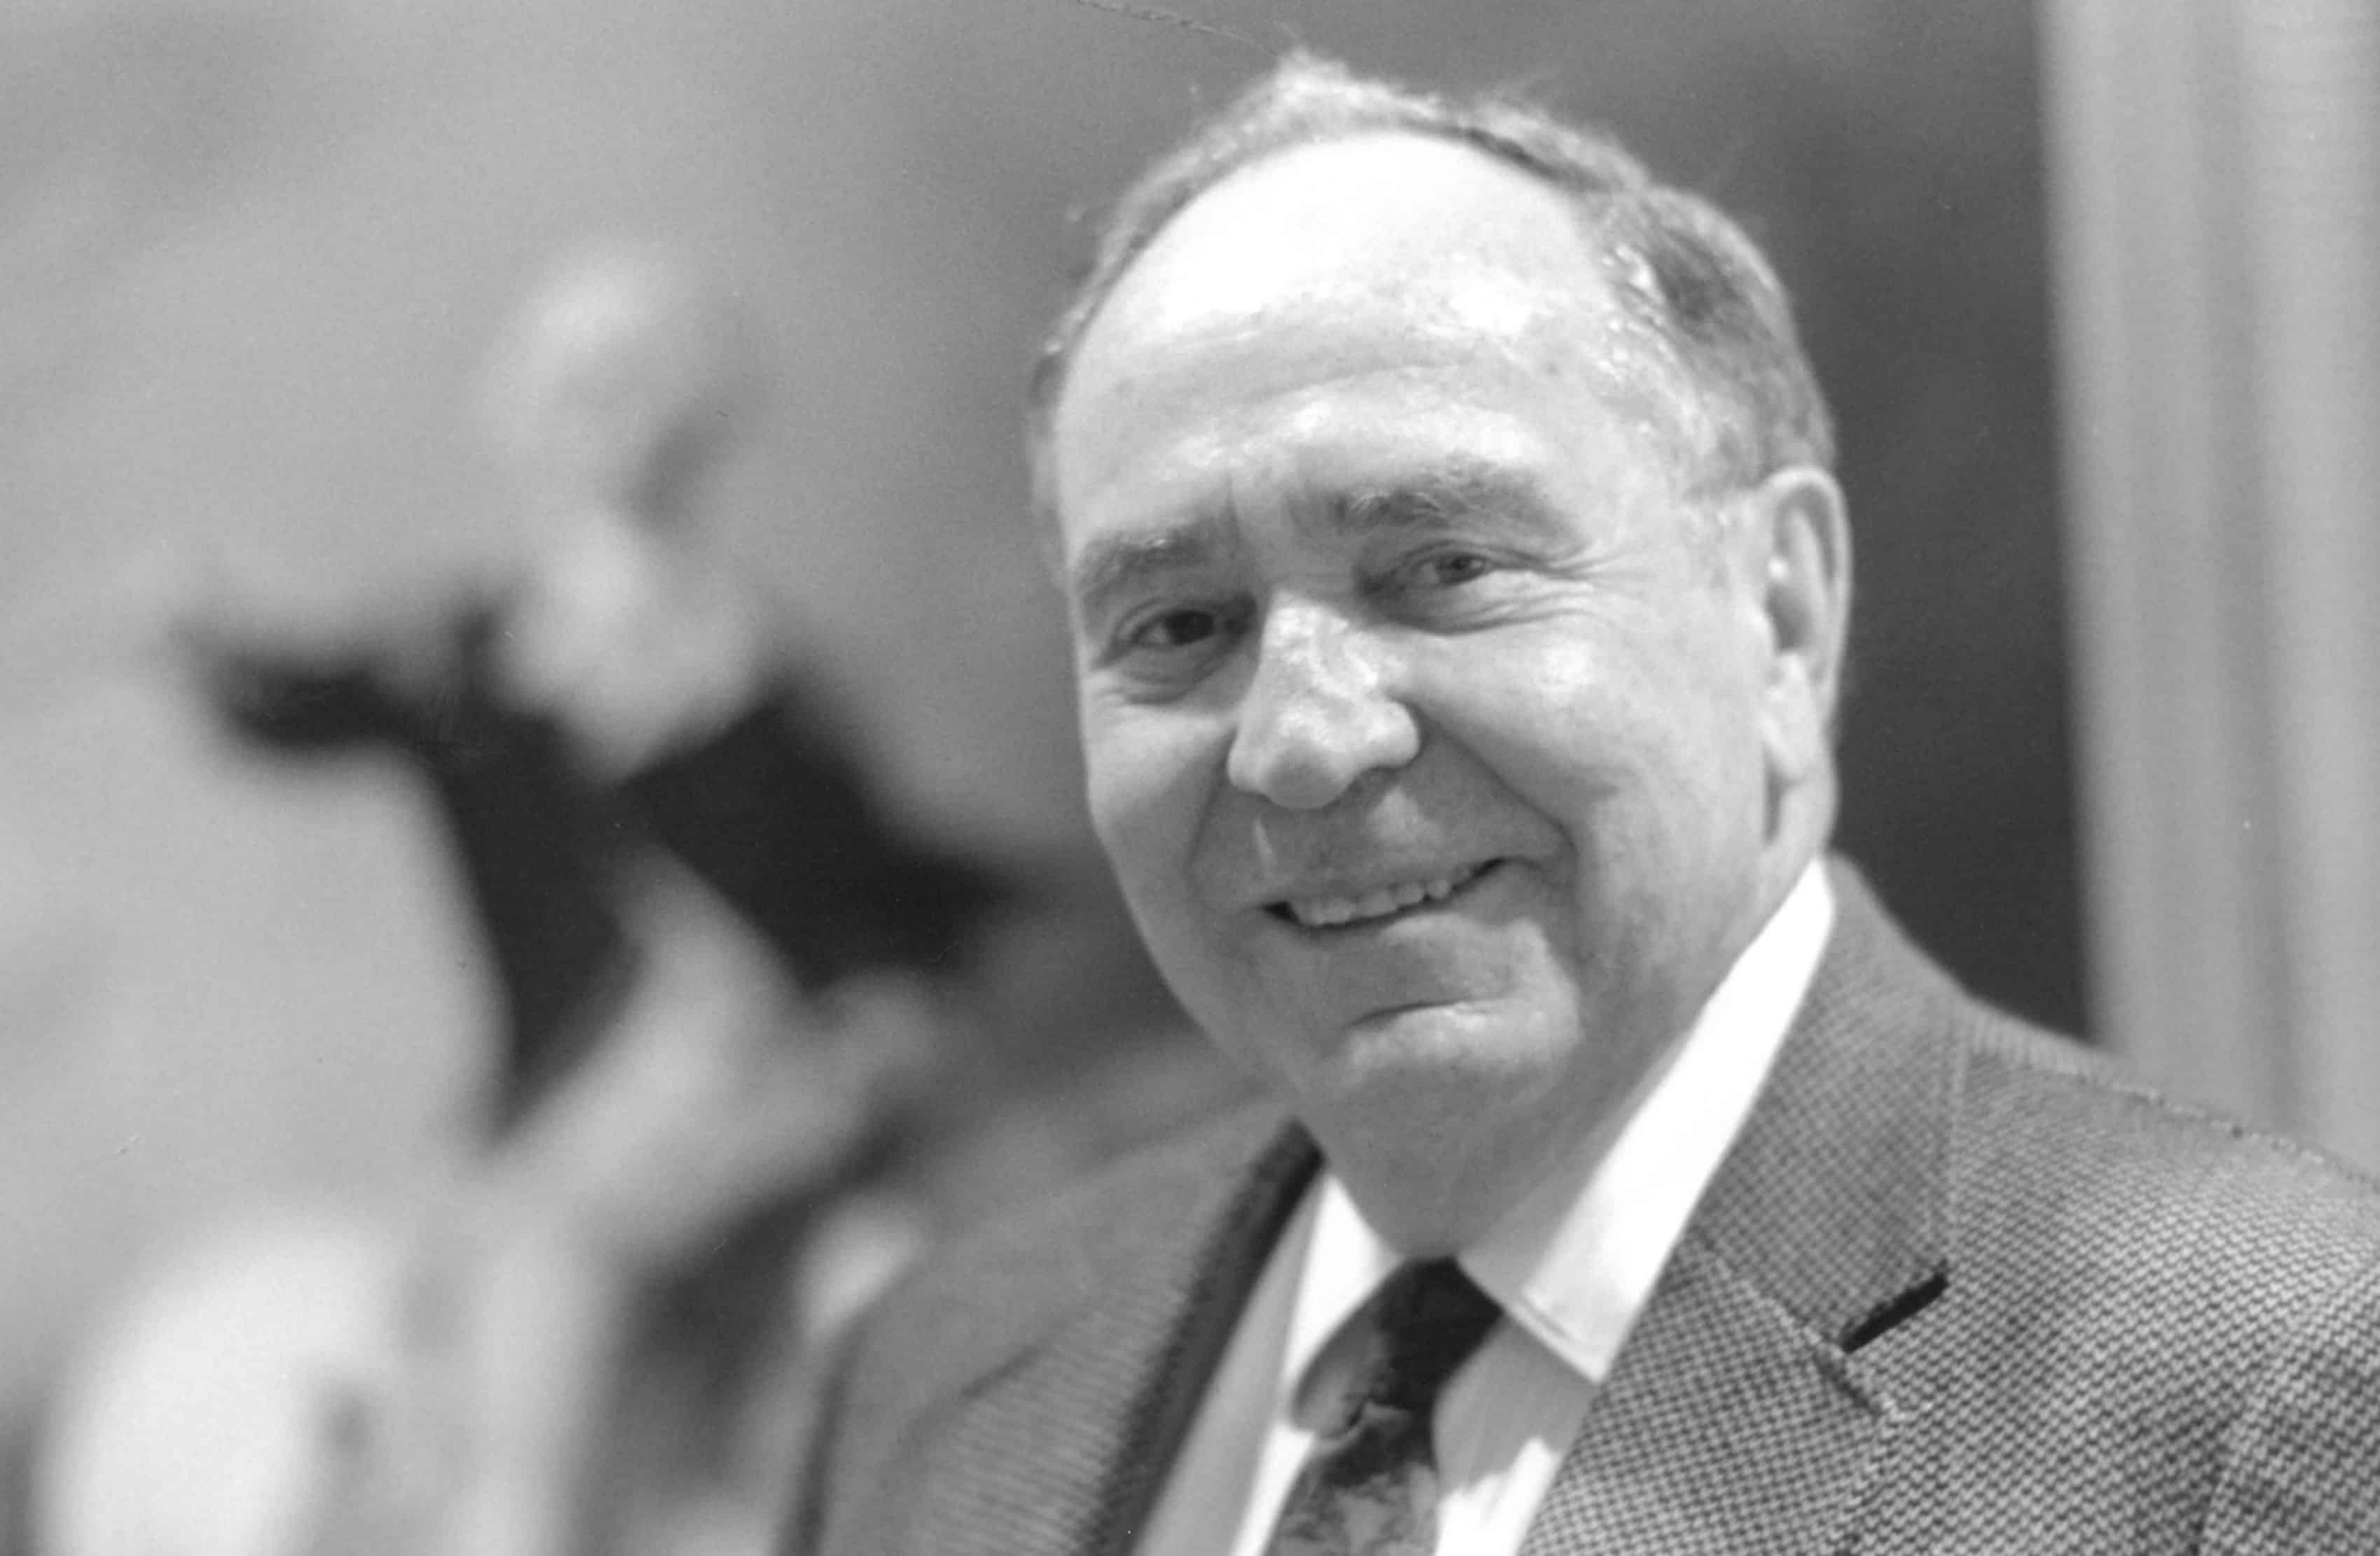 Jack Warner 40 WL Trustee Emeritus Dies At 99 Generously Supported Several Areas Of